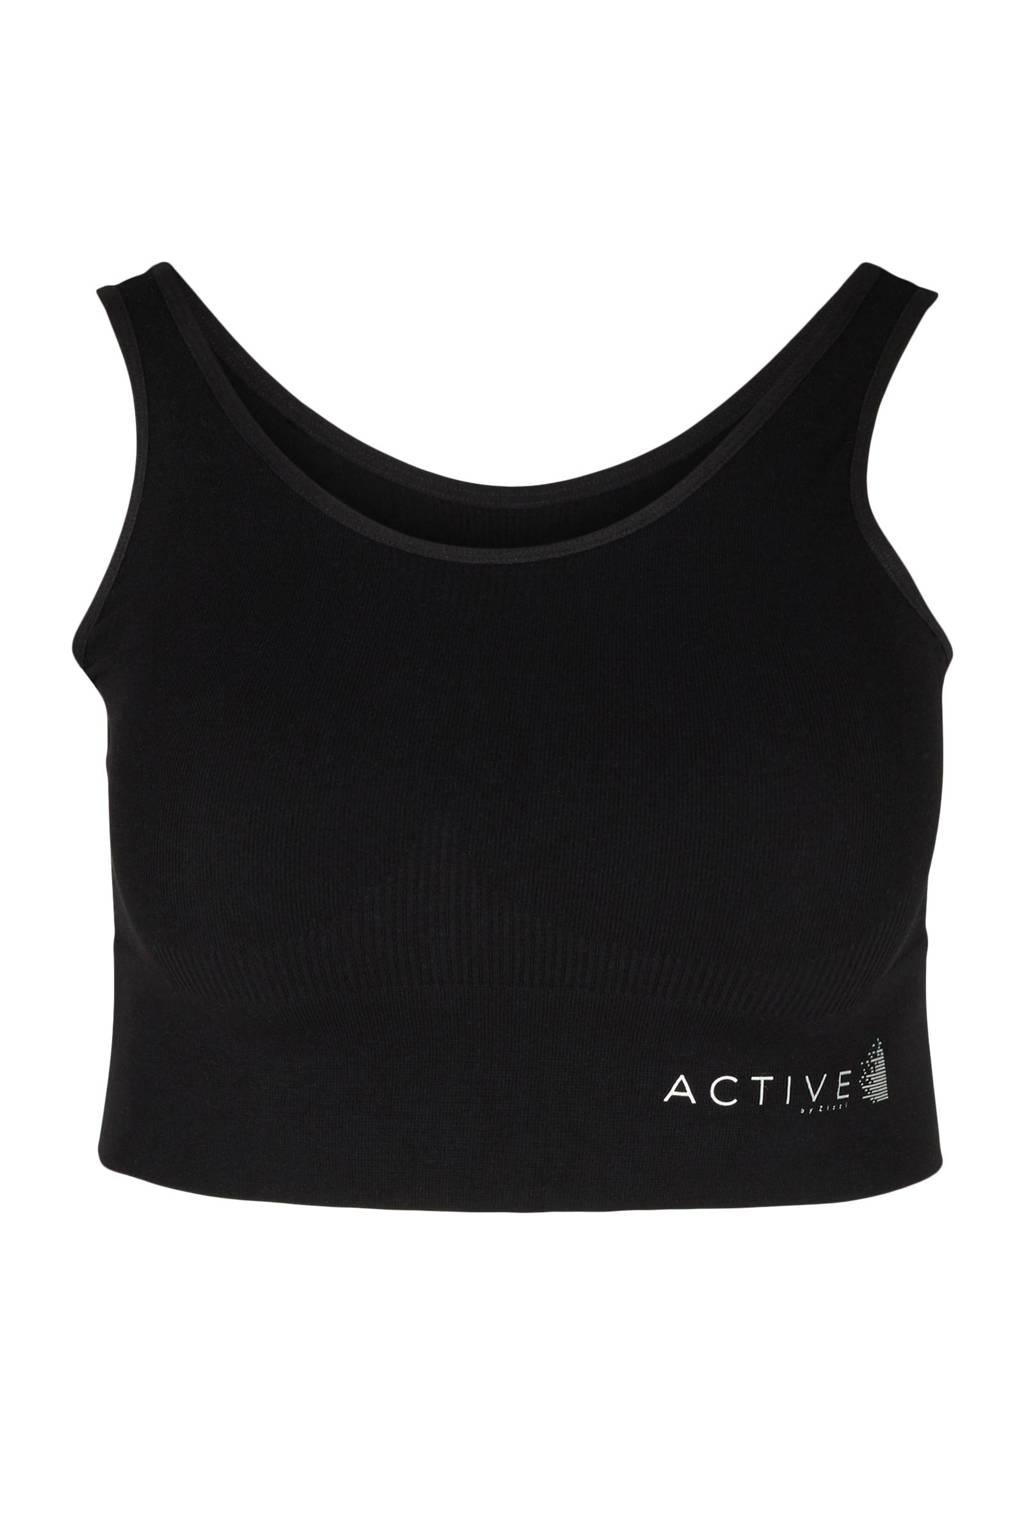 ACTIVE By Zizzi level 3 sportbh zwart, Zwart